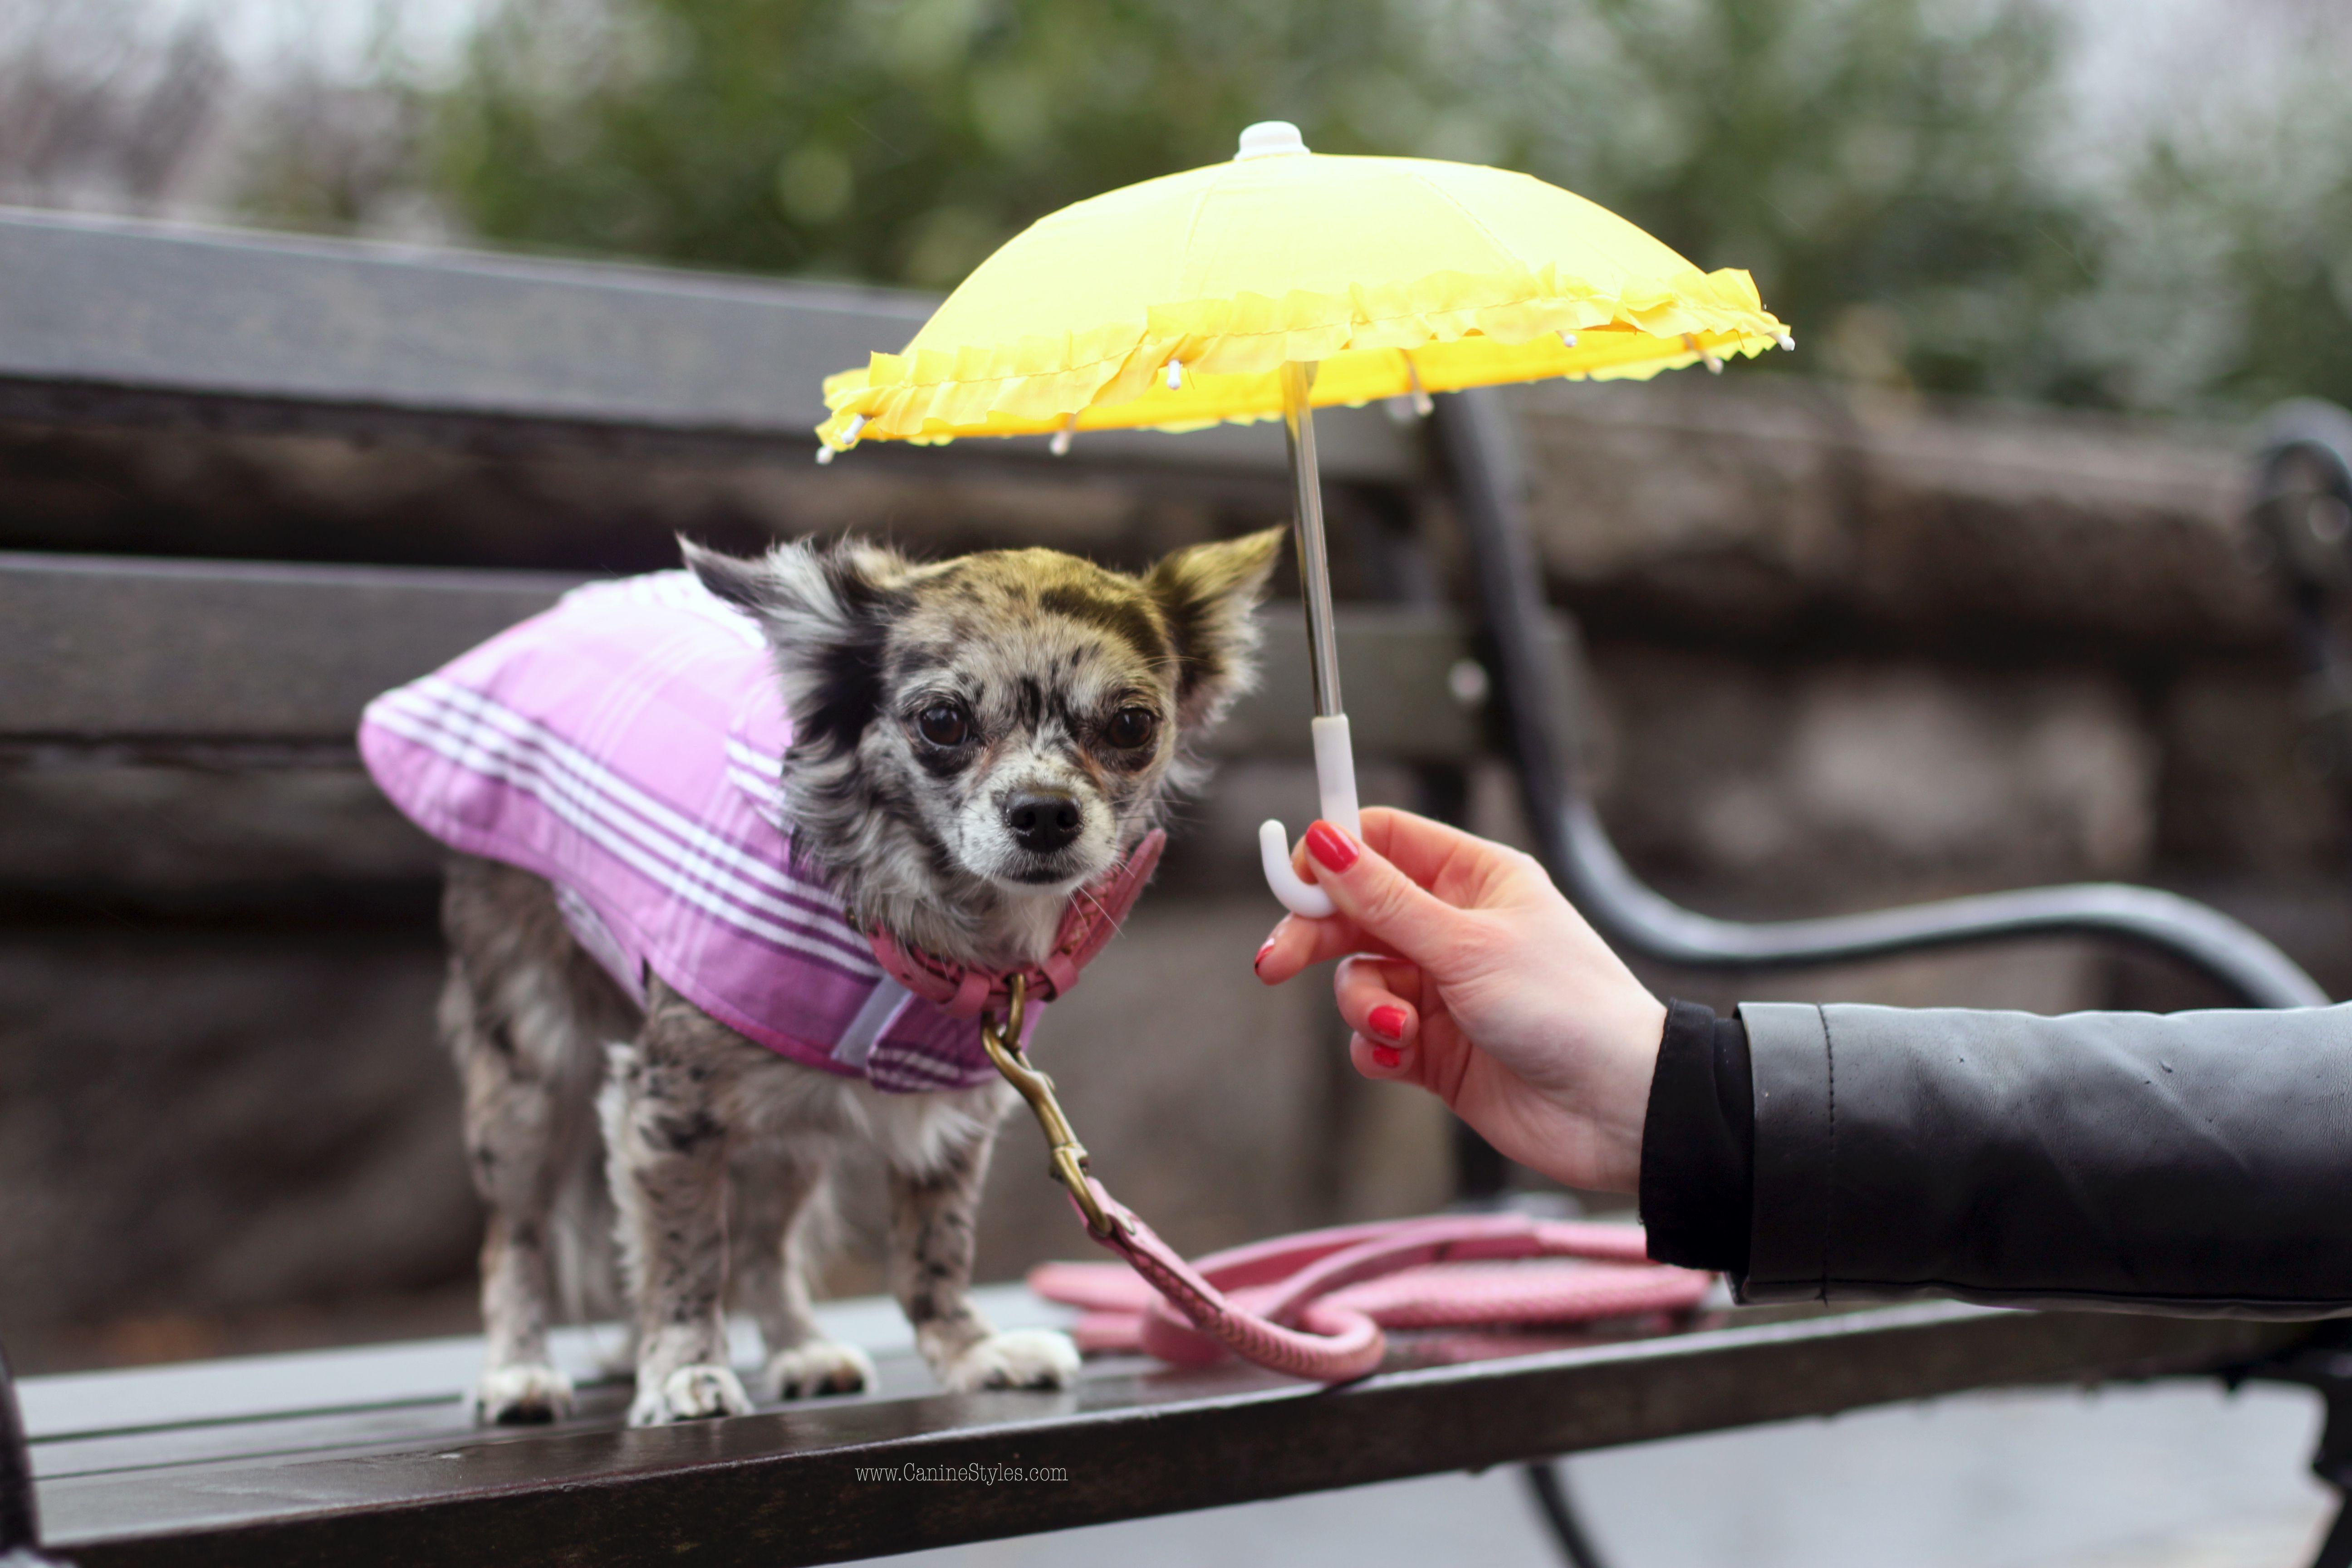 Pebbles Known On Instagram As Flintstonepups Picks Out Her Favorite Rainy Day Dog Gear Purple Plaid Rain Coat Braid Le Canine Dog Gear Funny Dog Photos